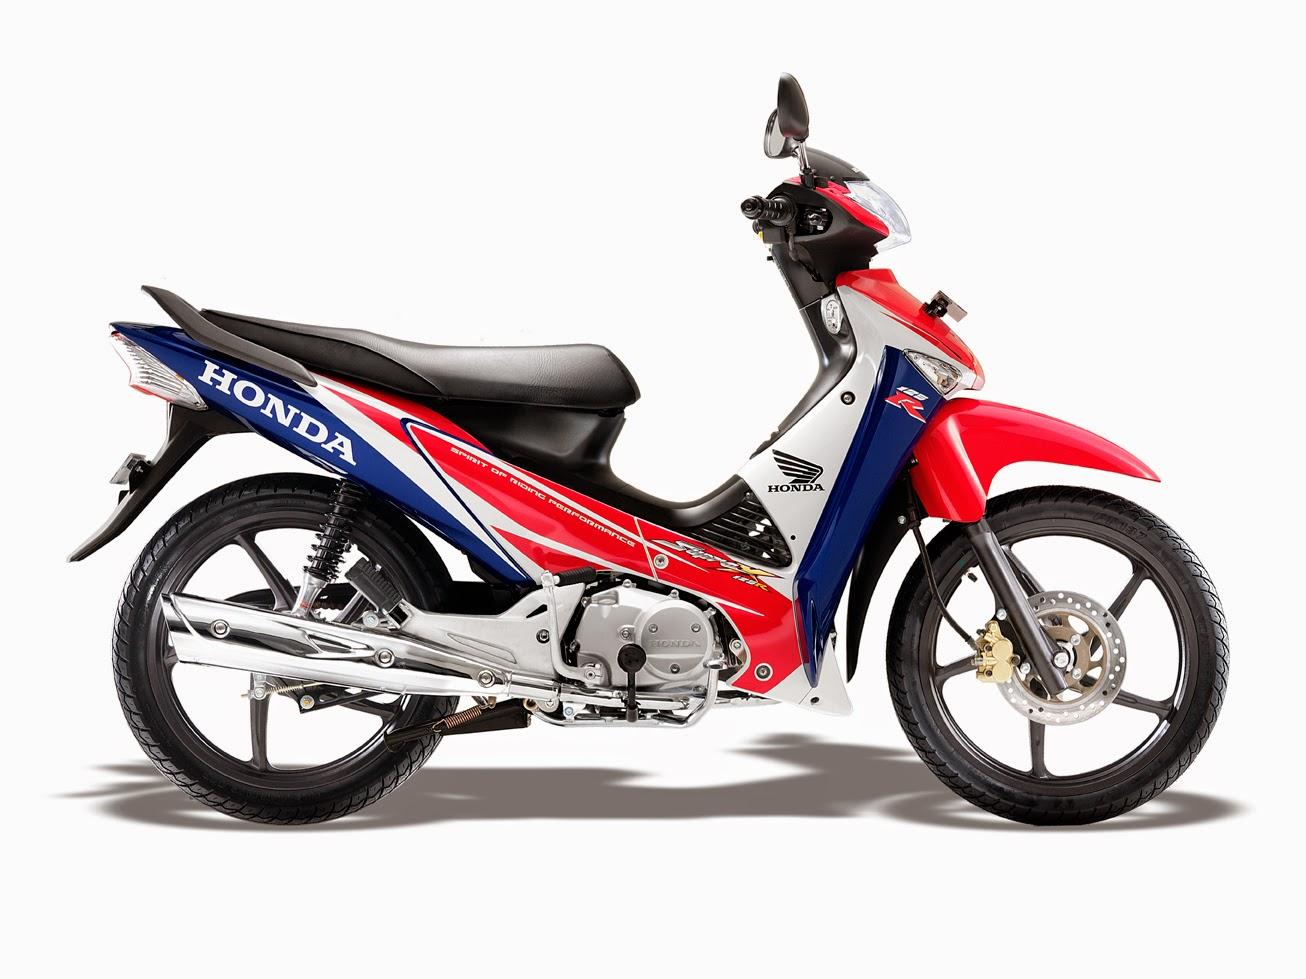 Modifikasi Motor Honda Karisma 125 X Thecitycyclist